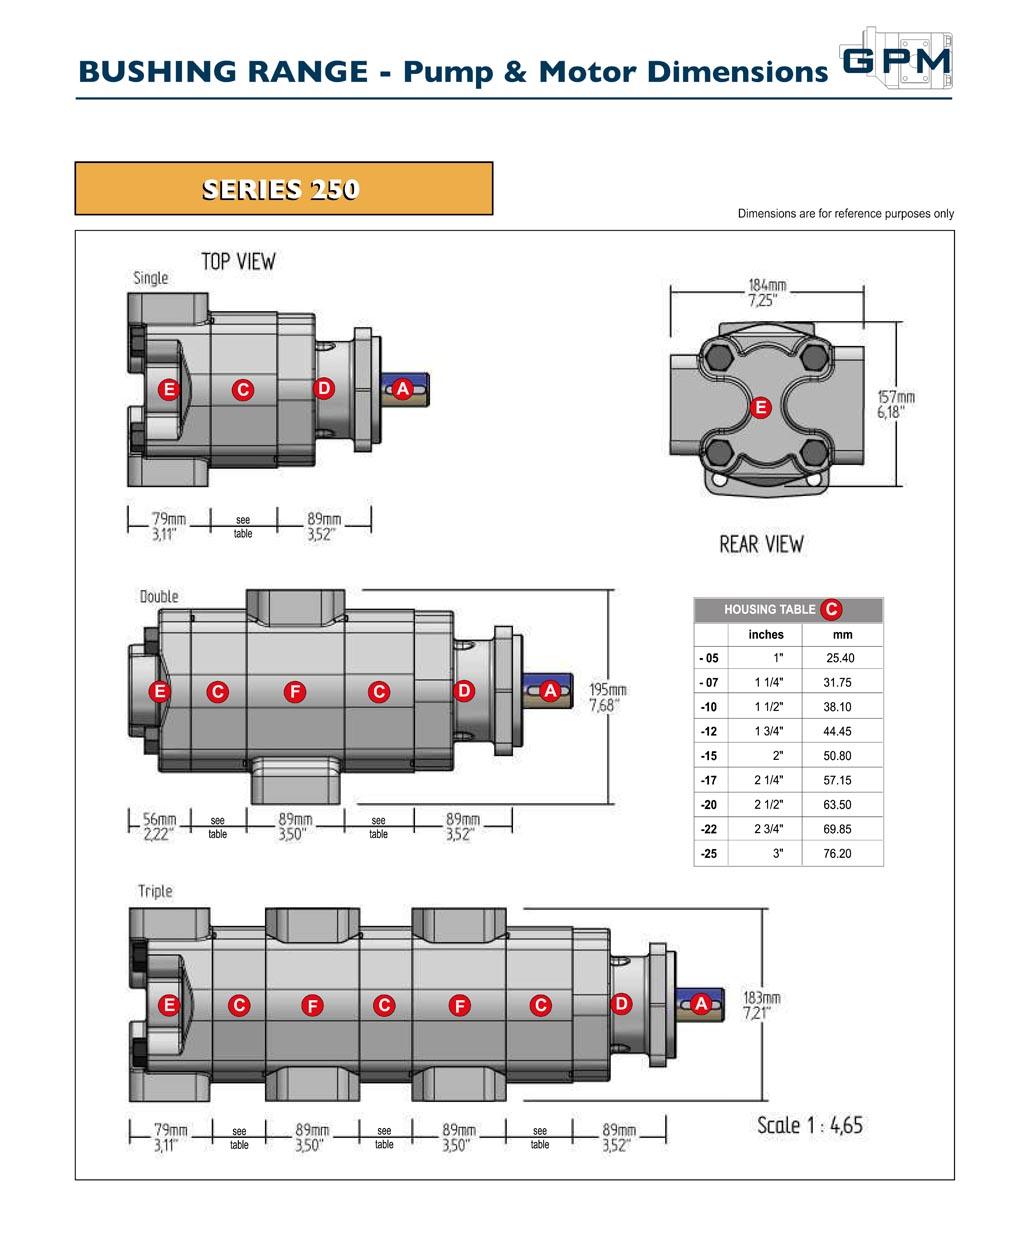 GPM Bushing Pump & Motor Dimensions-3